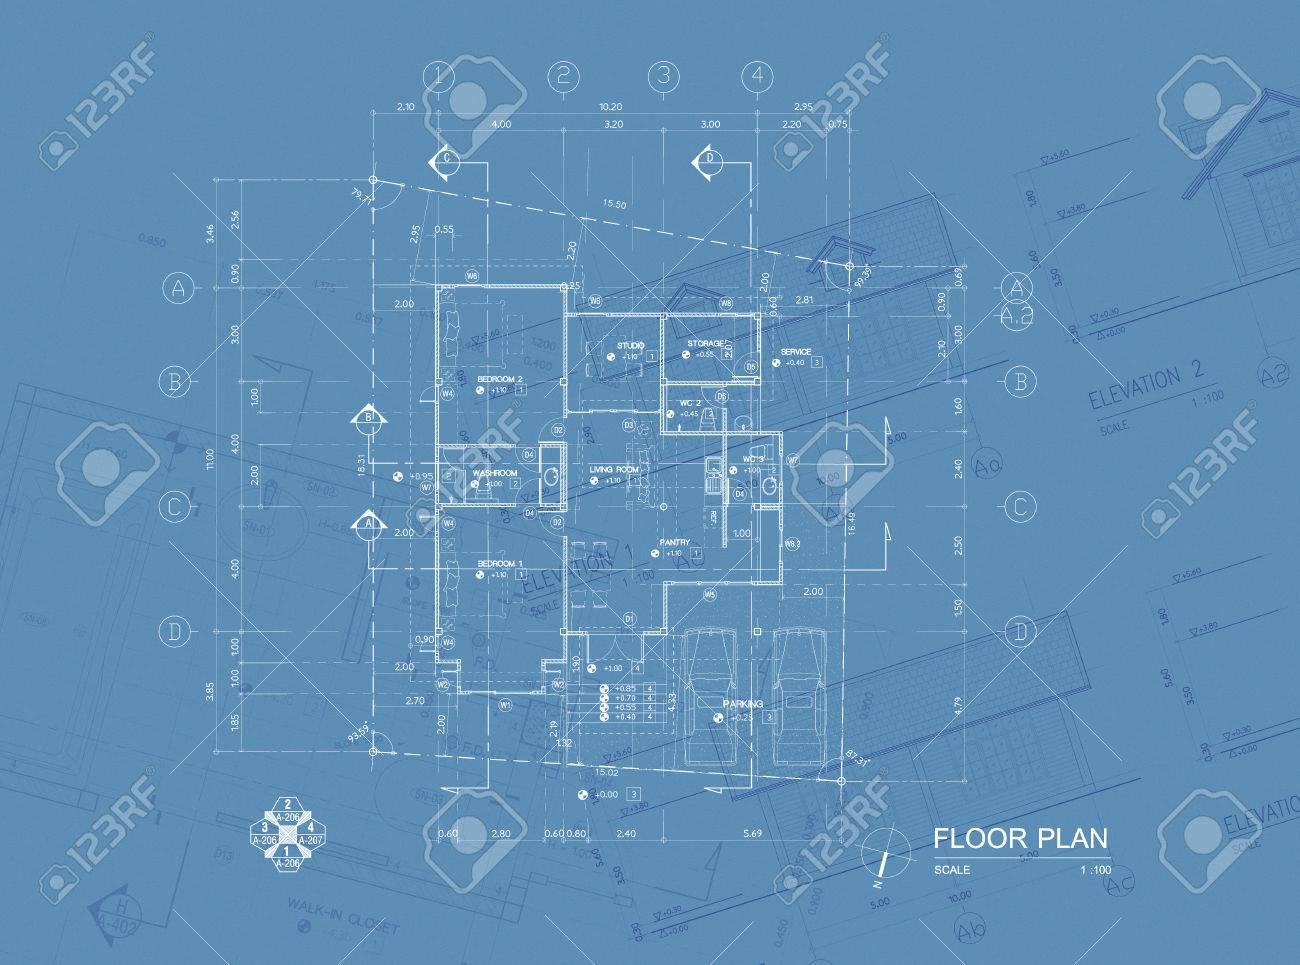 Overlay of house blueprint floor plan elevations